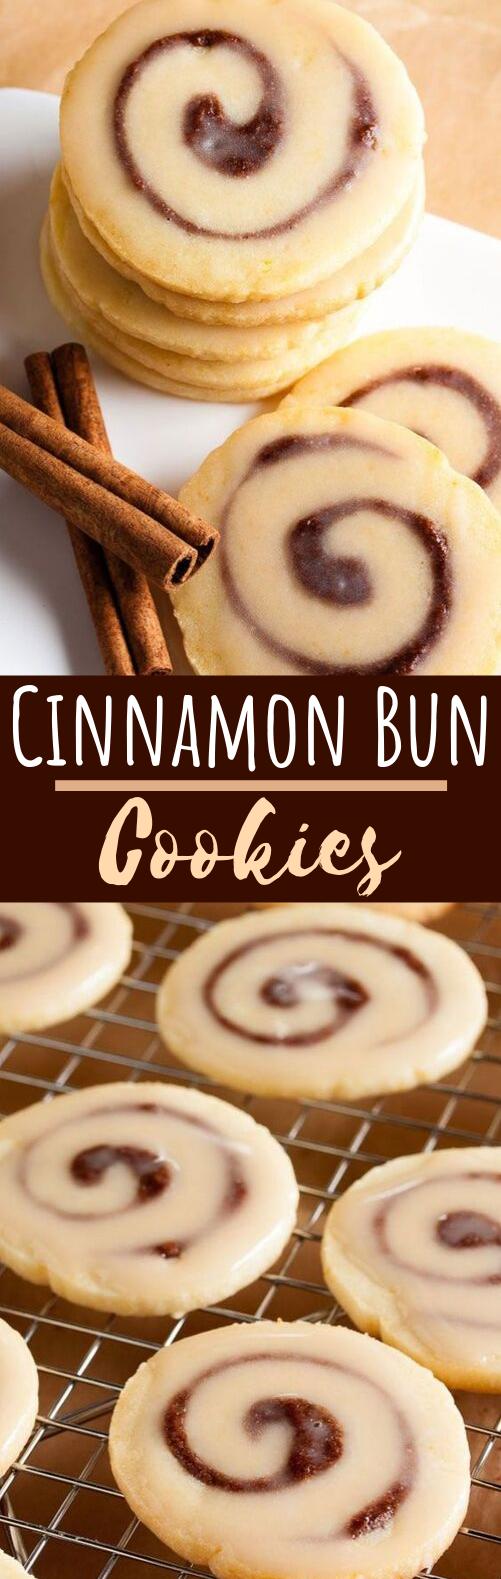 Cinnamon Bun Cookies #cookies #desserts